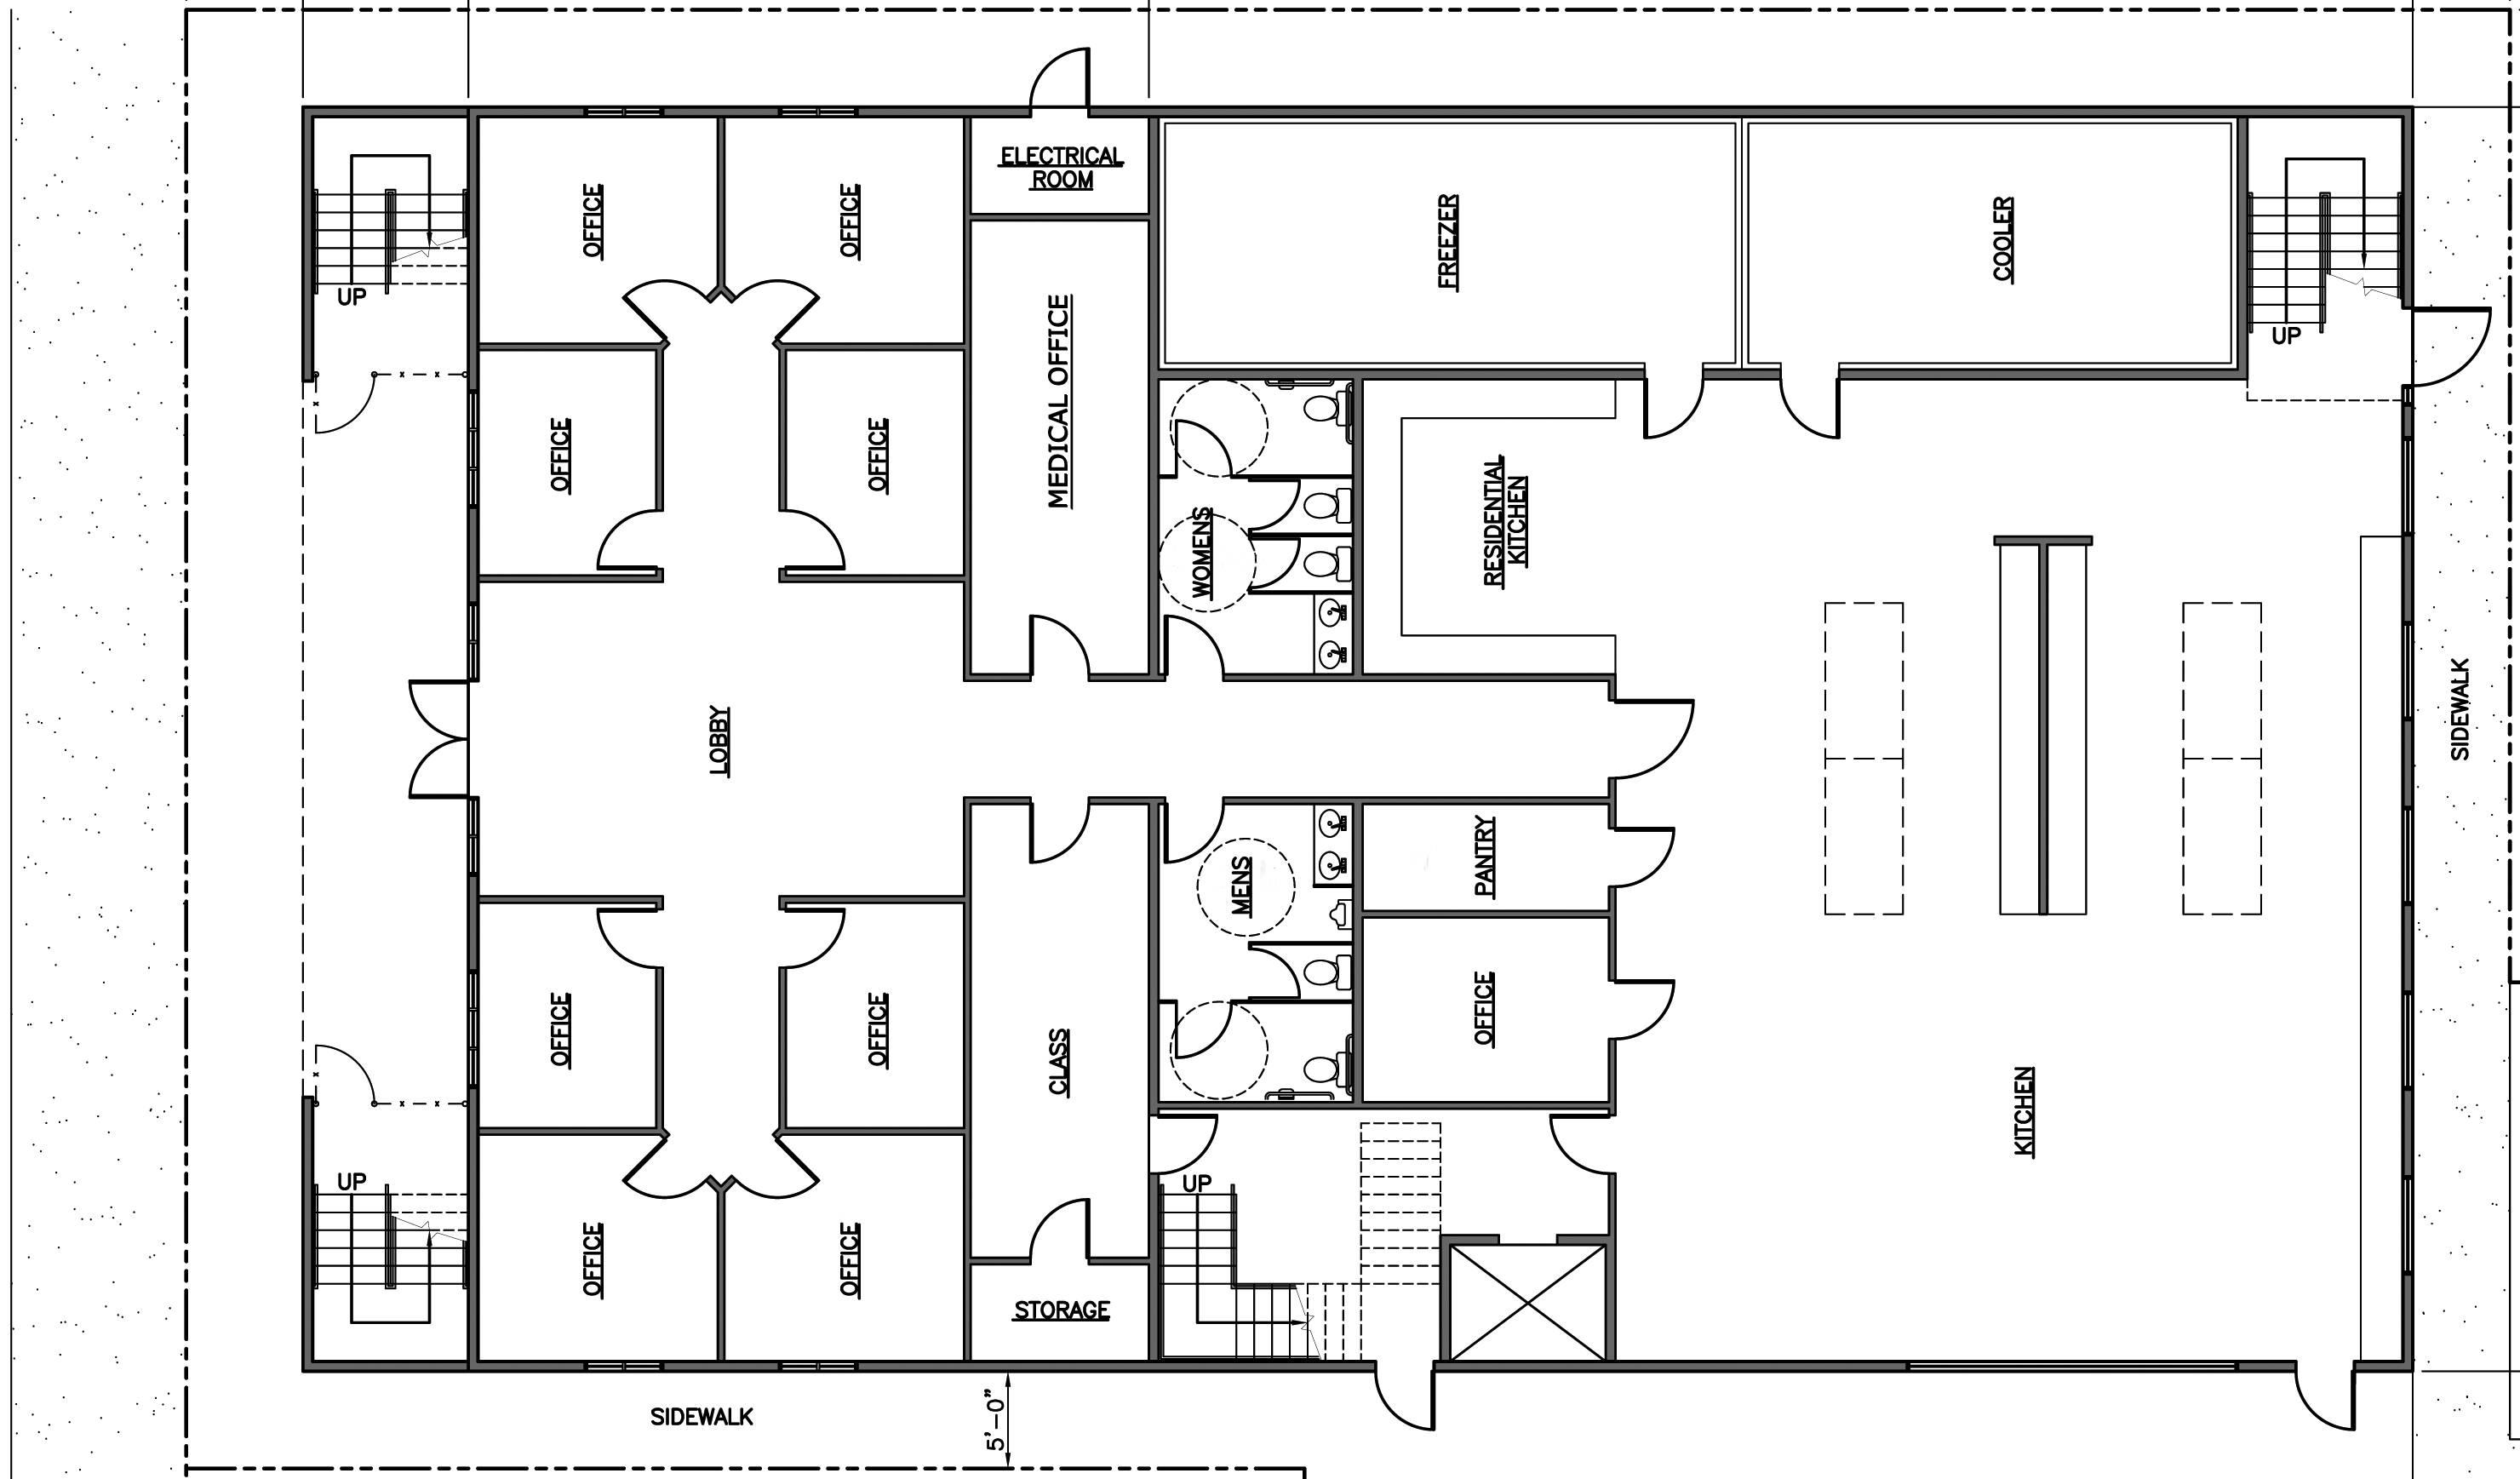 Architectural Floor Plans Interior   House Plans   20